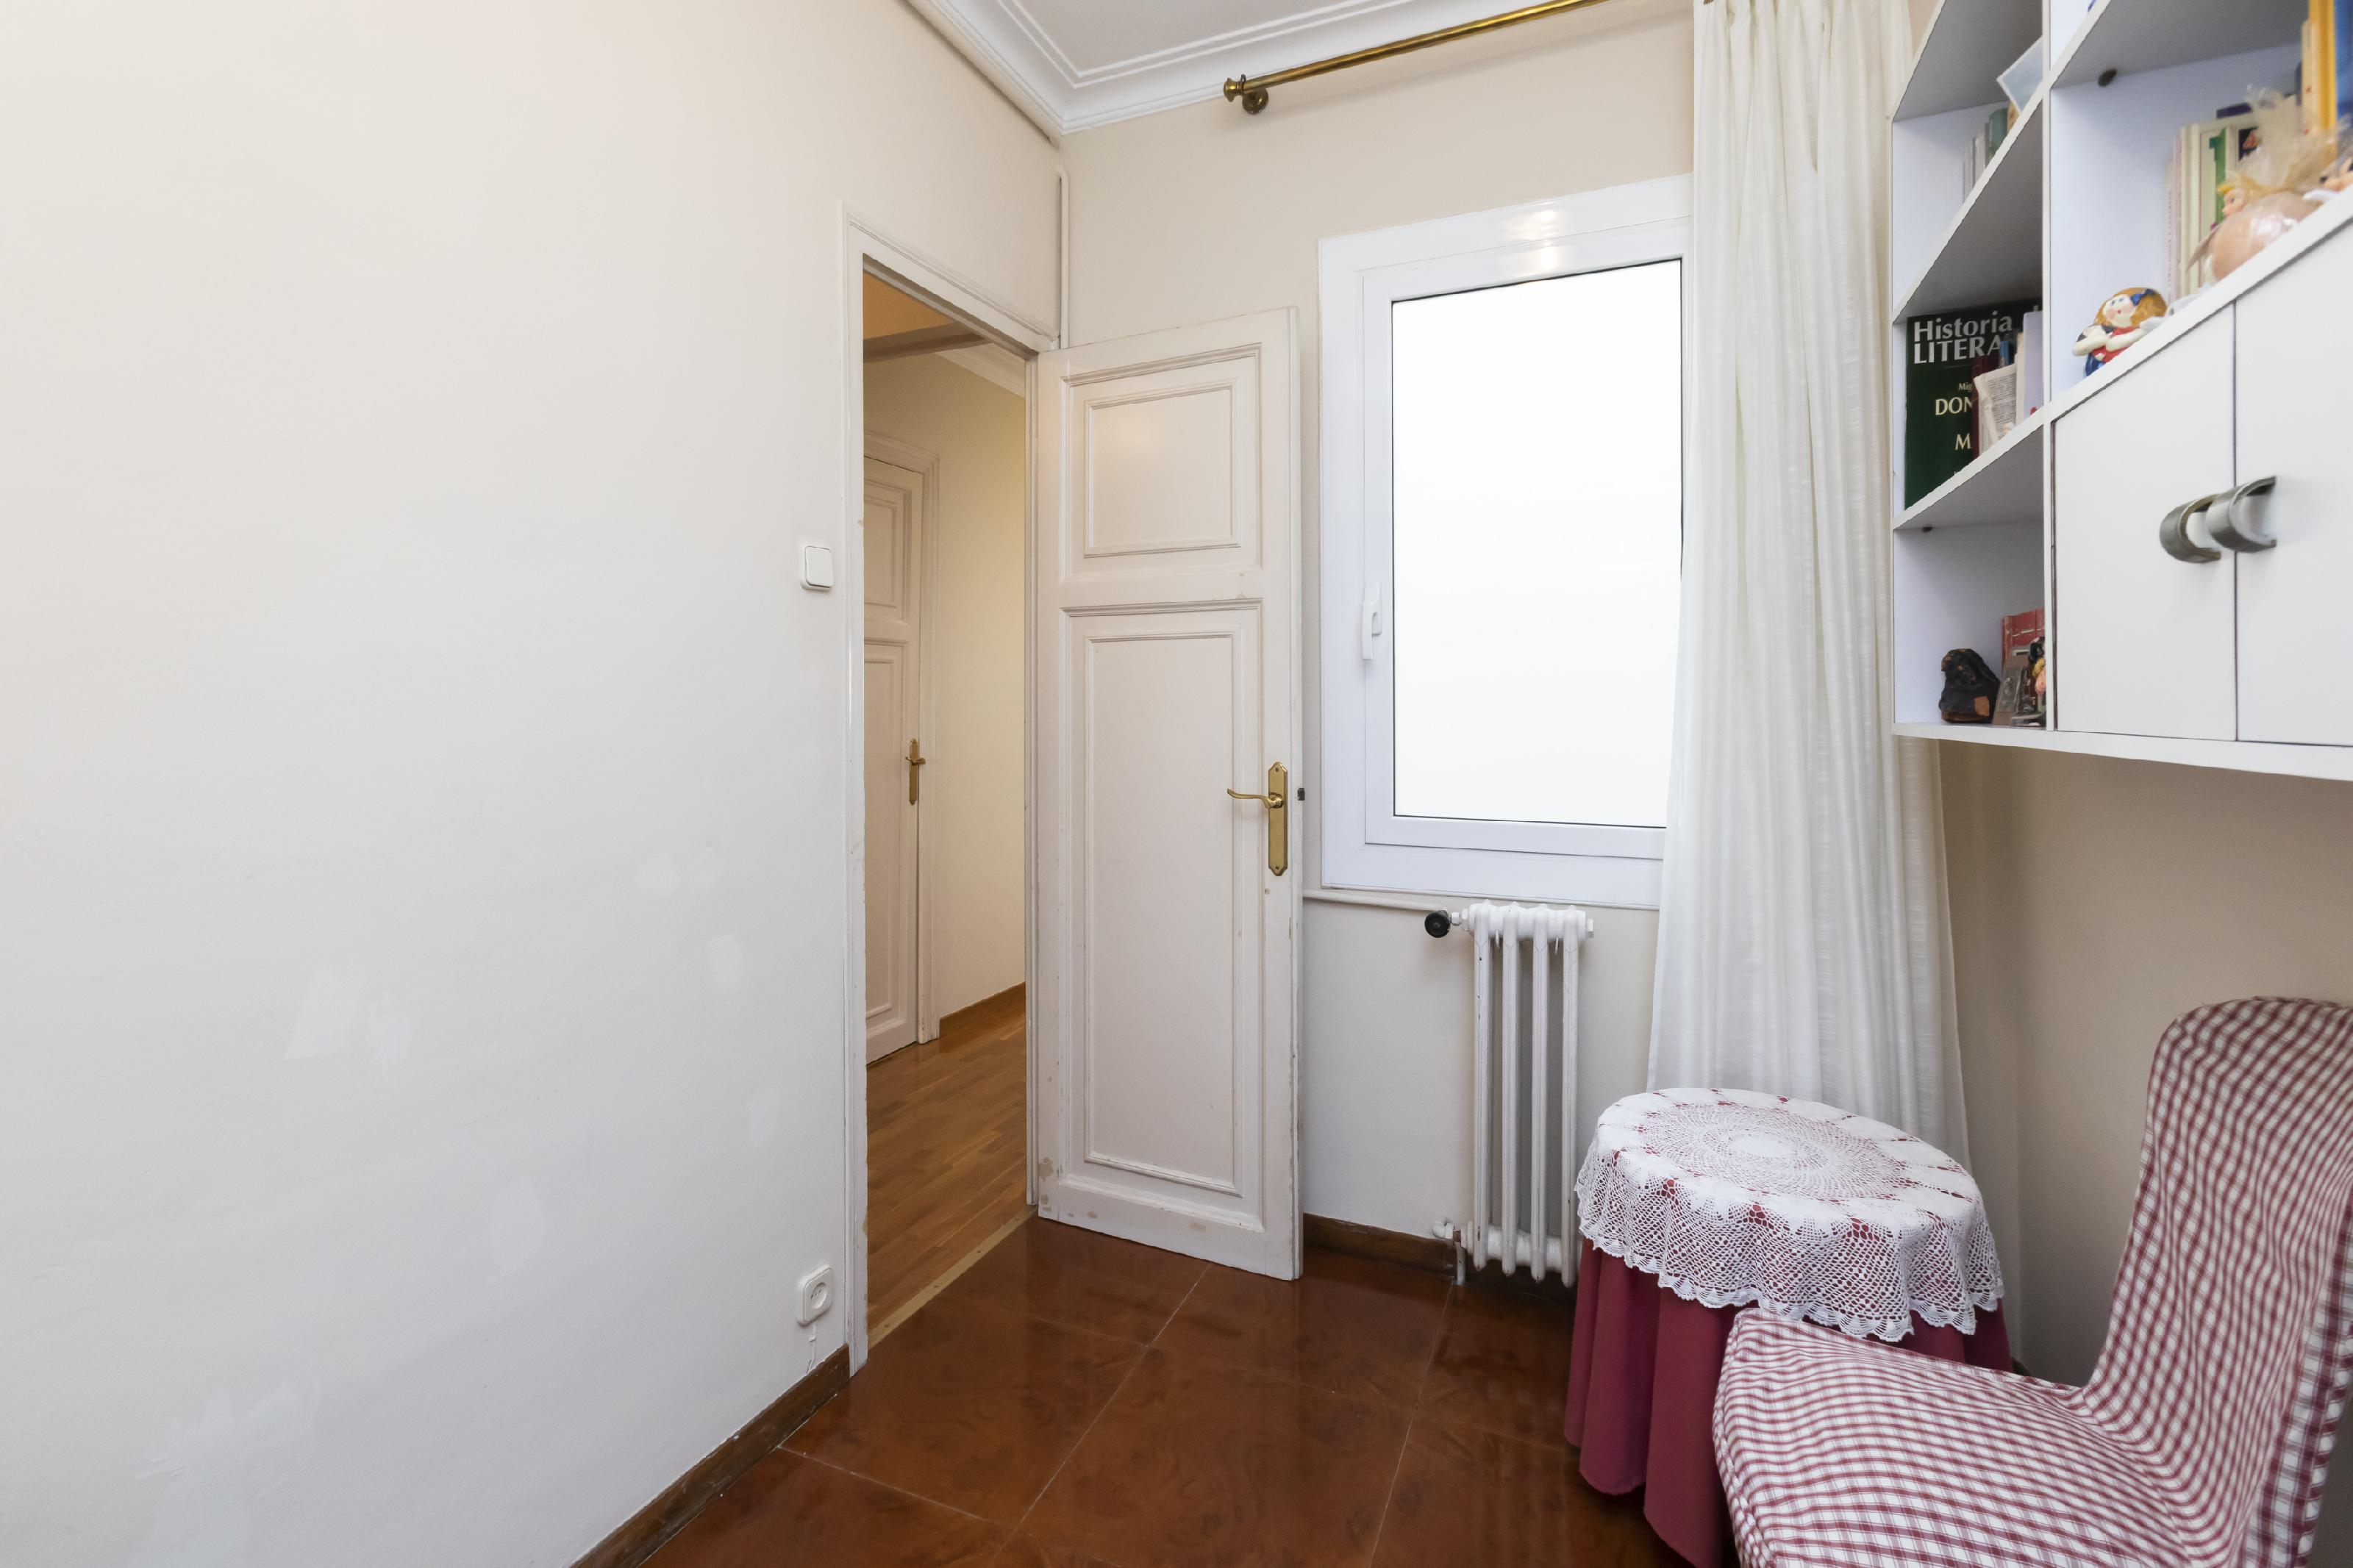 247097 Flat for sale in Sarrià-Sant Gervasi, Sant Gervasi-Galvany 27